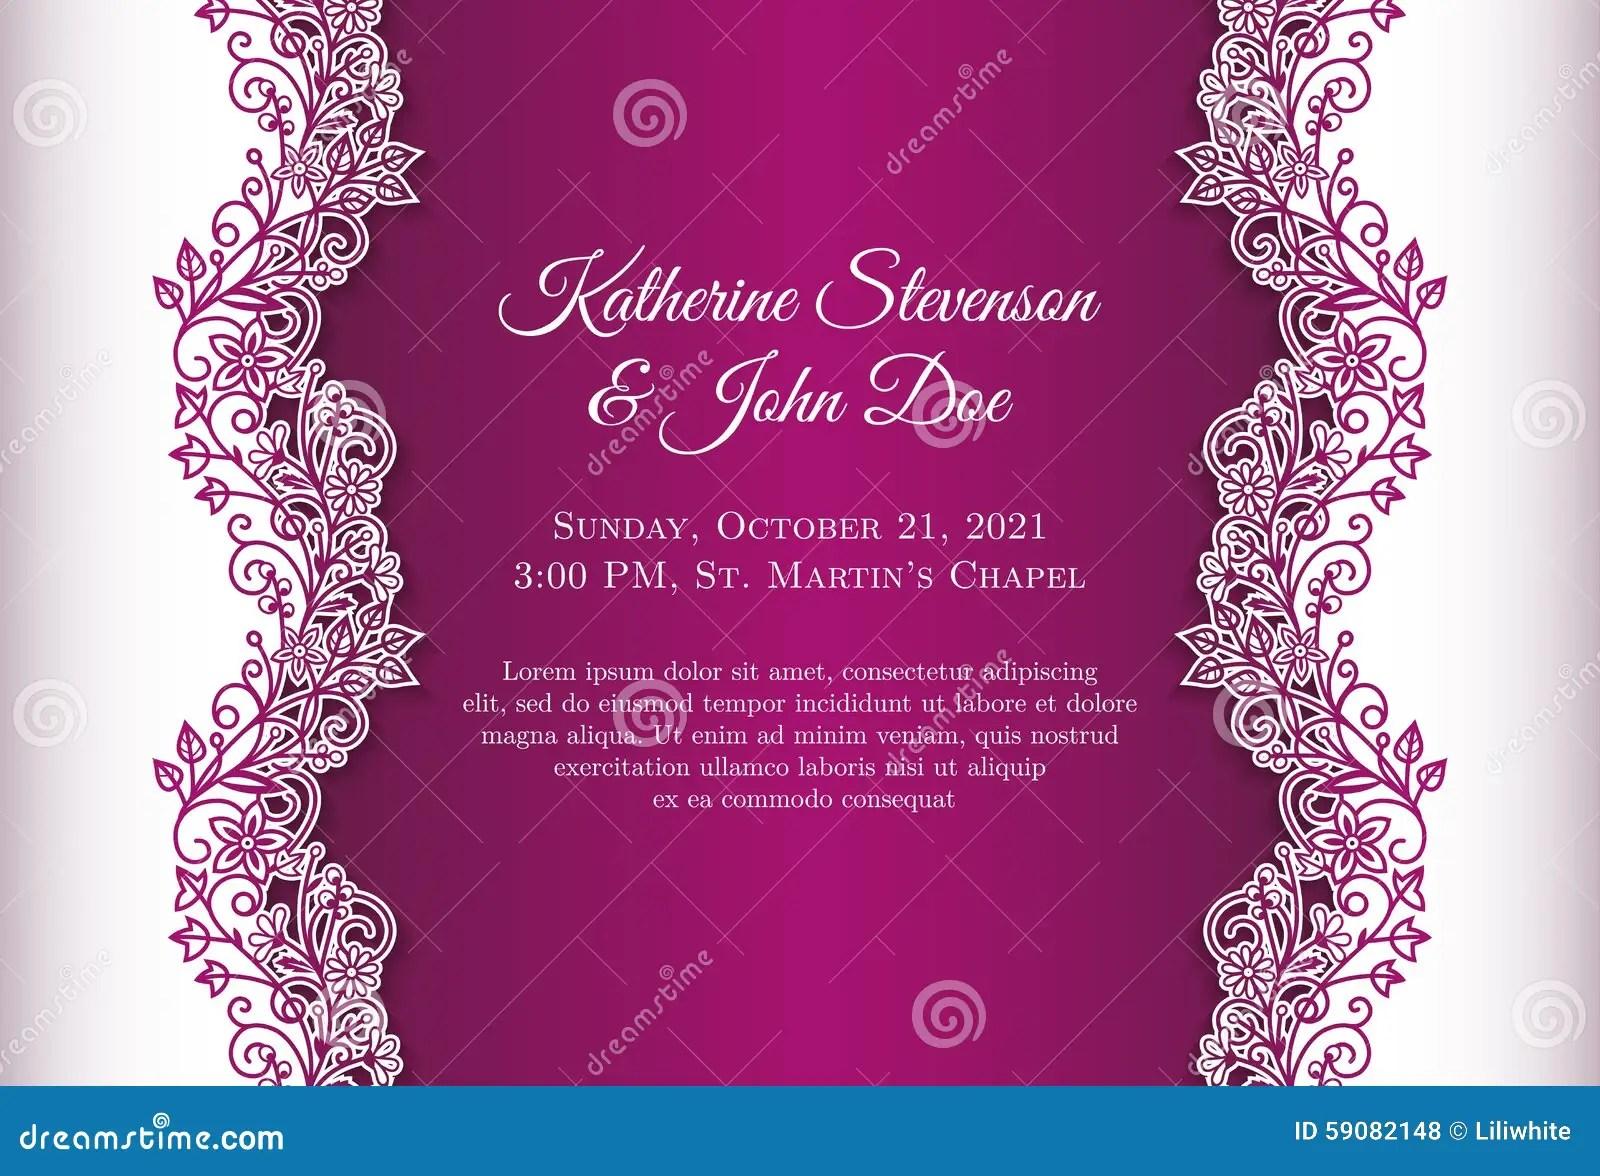 invitation letter for australibusiness visa%0A Wedding Invitation Letter Background How To Write An Invitation Letter  Letter Writing Guide Romantic Wedding Invitation